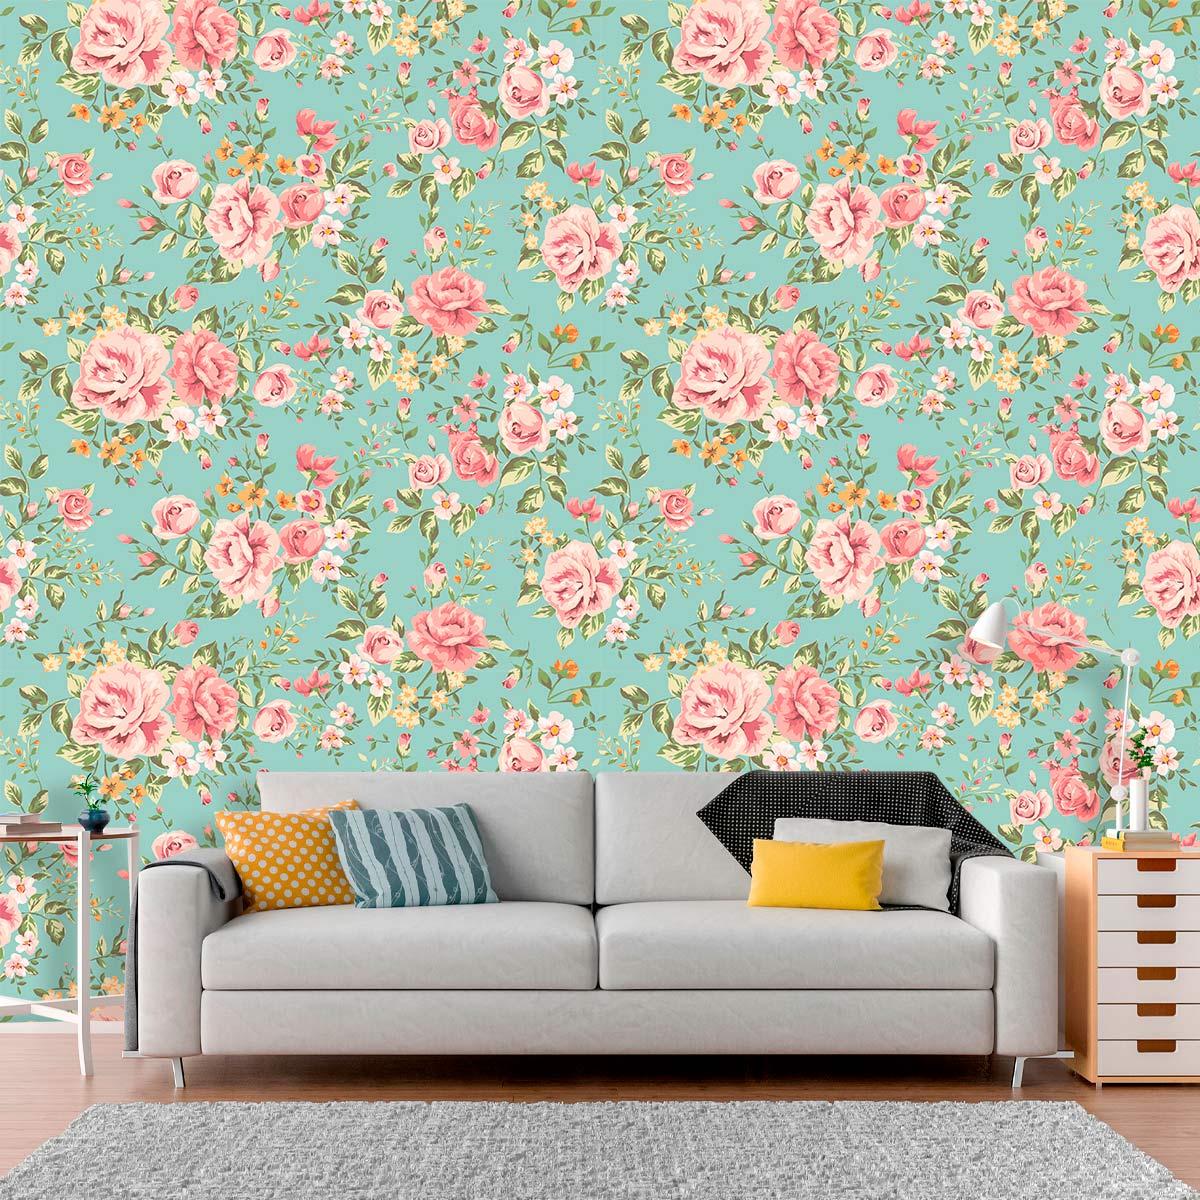 Papel de Parede Floral Flores Rosas Luxo Adesivo